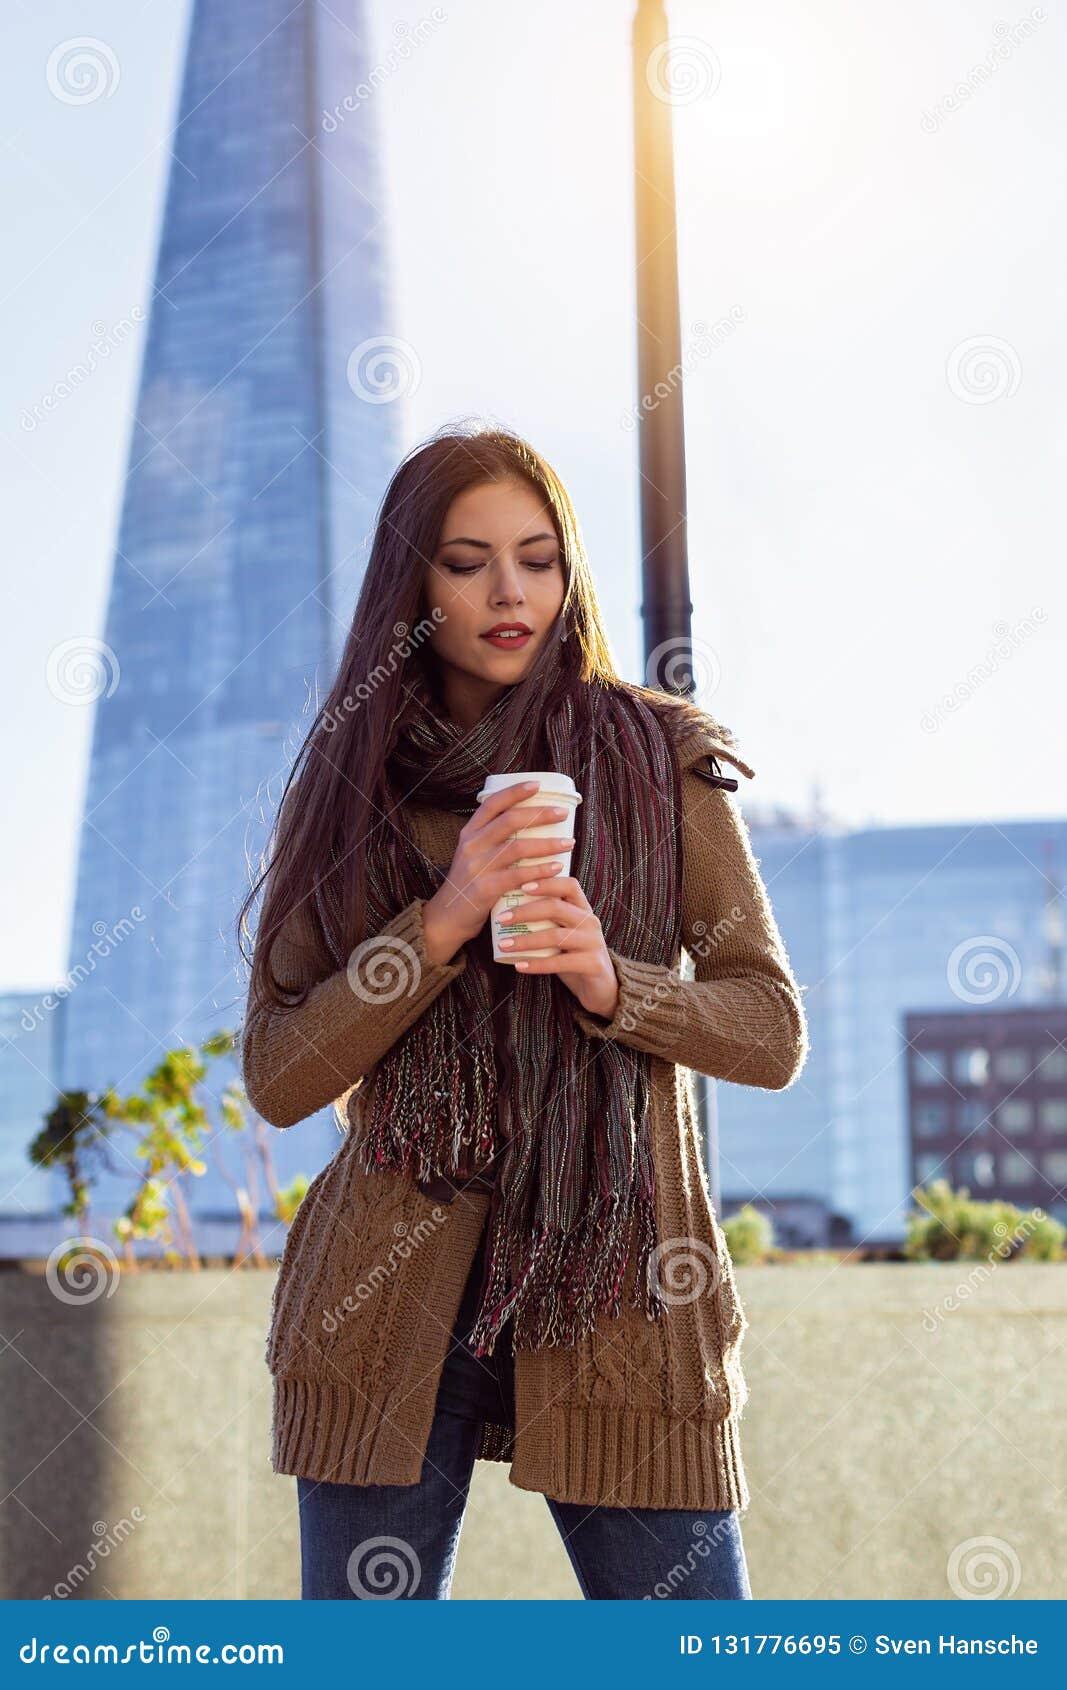 Fashionista woman in outdoors London, UK